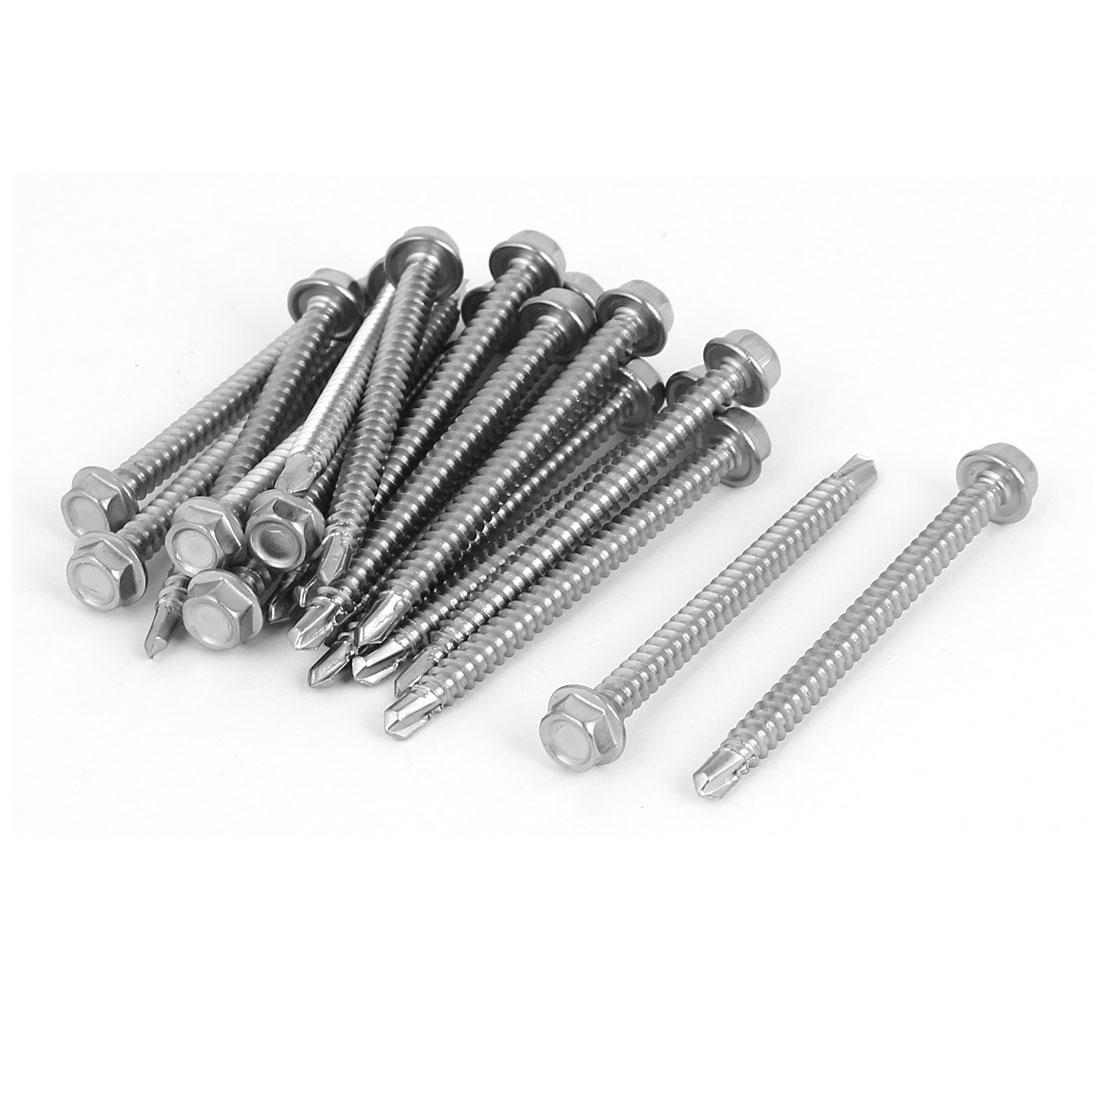 M4.2x50mm Thread 410 Stainless Steel Hex Washer Head Self Drilling Screws 20 Pcs